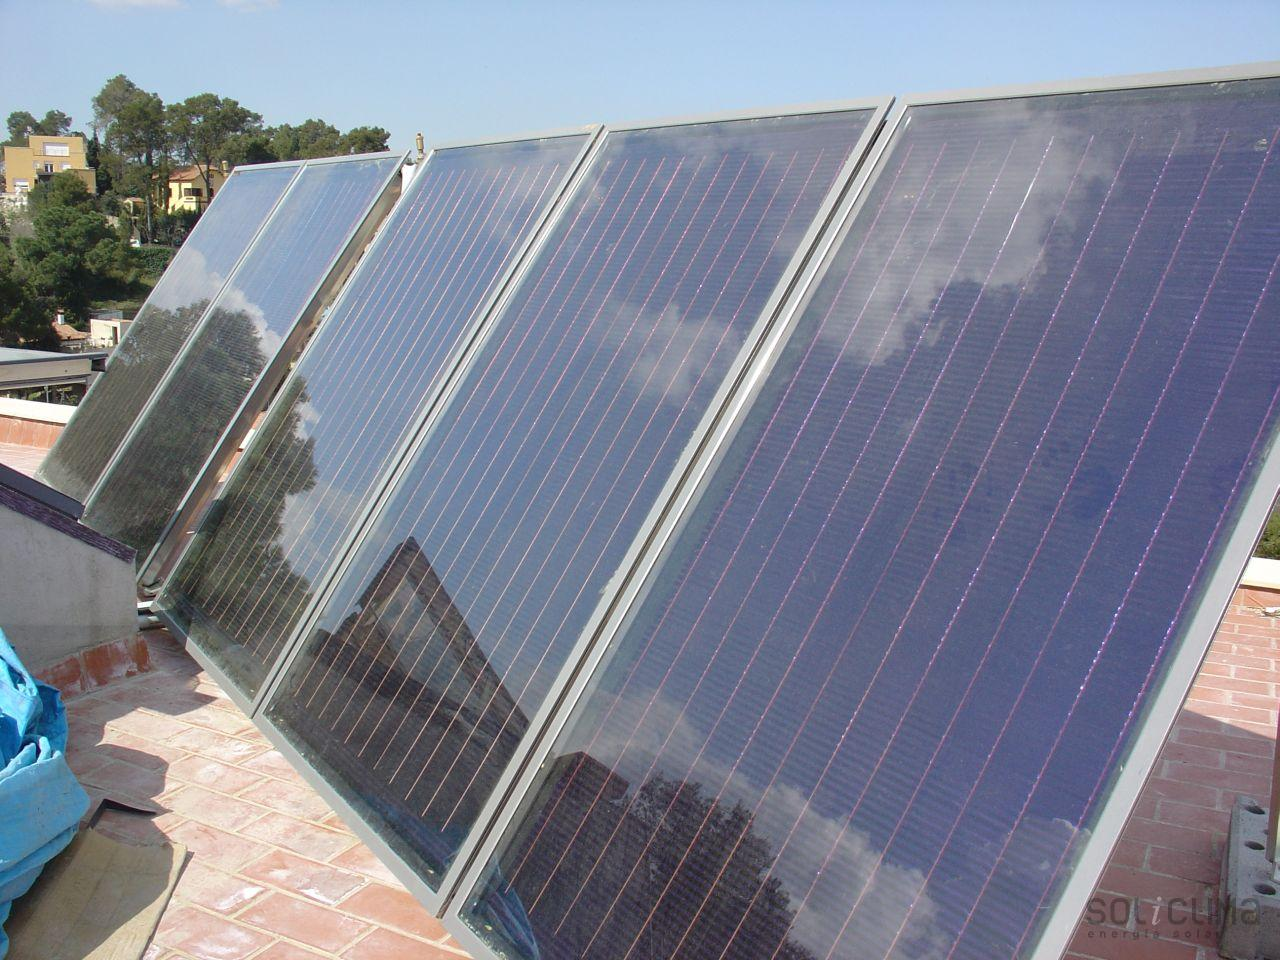 Agua caliente y calefacci n solar for Placas solares para calentar agua